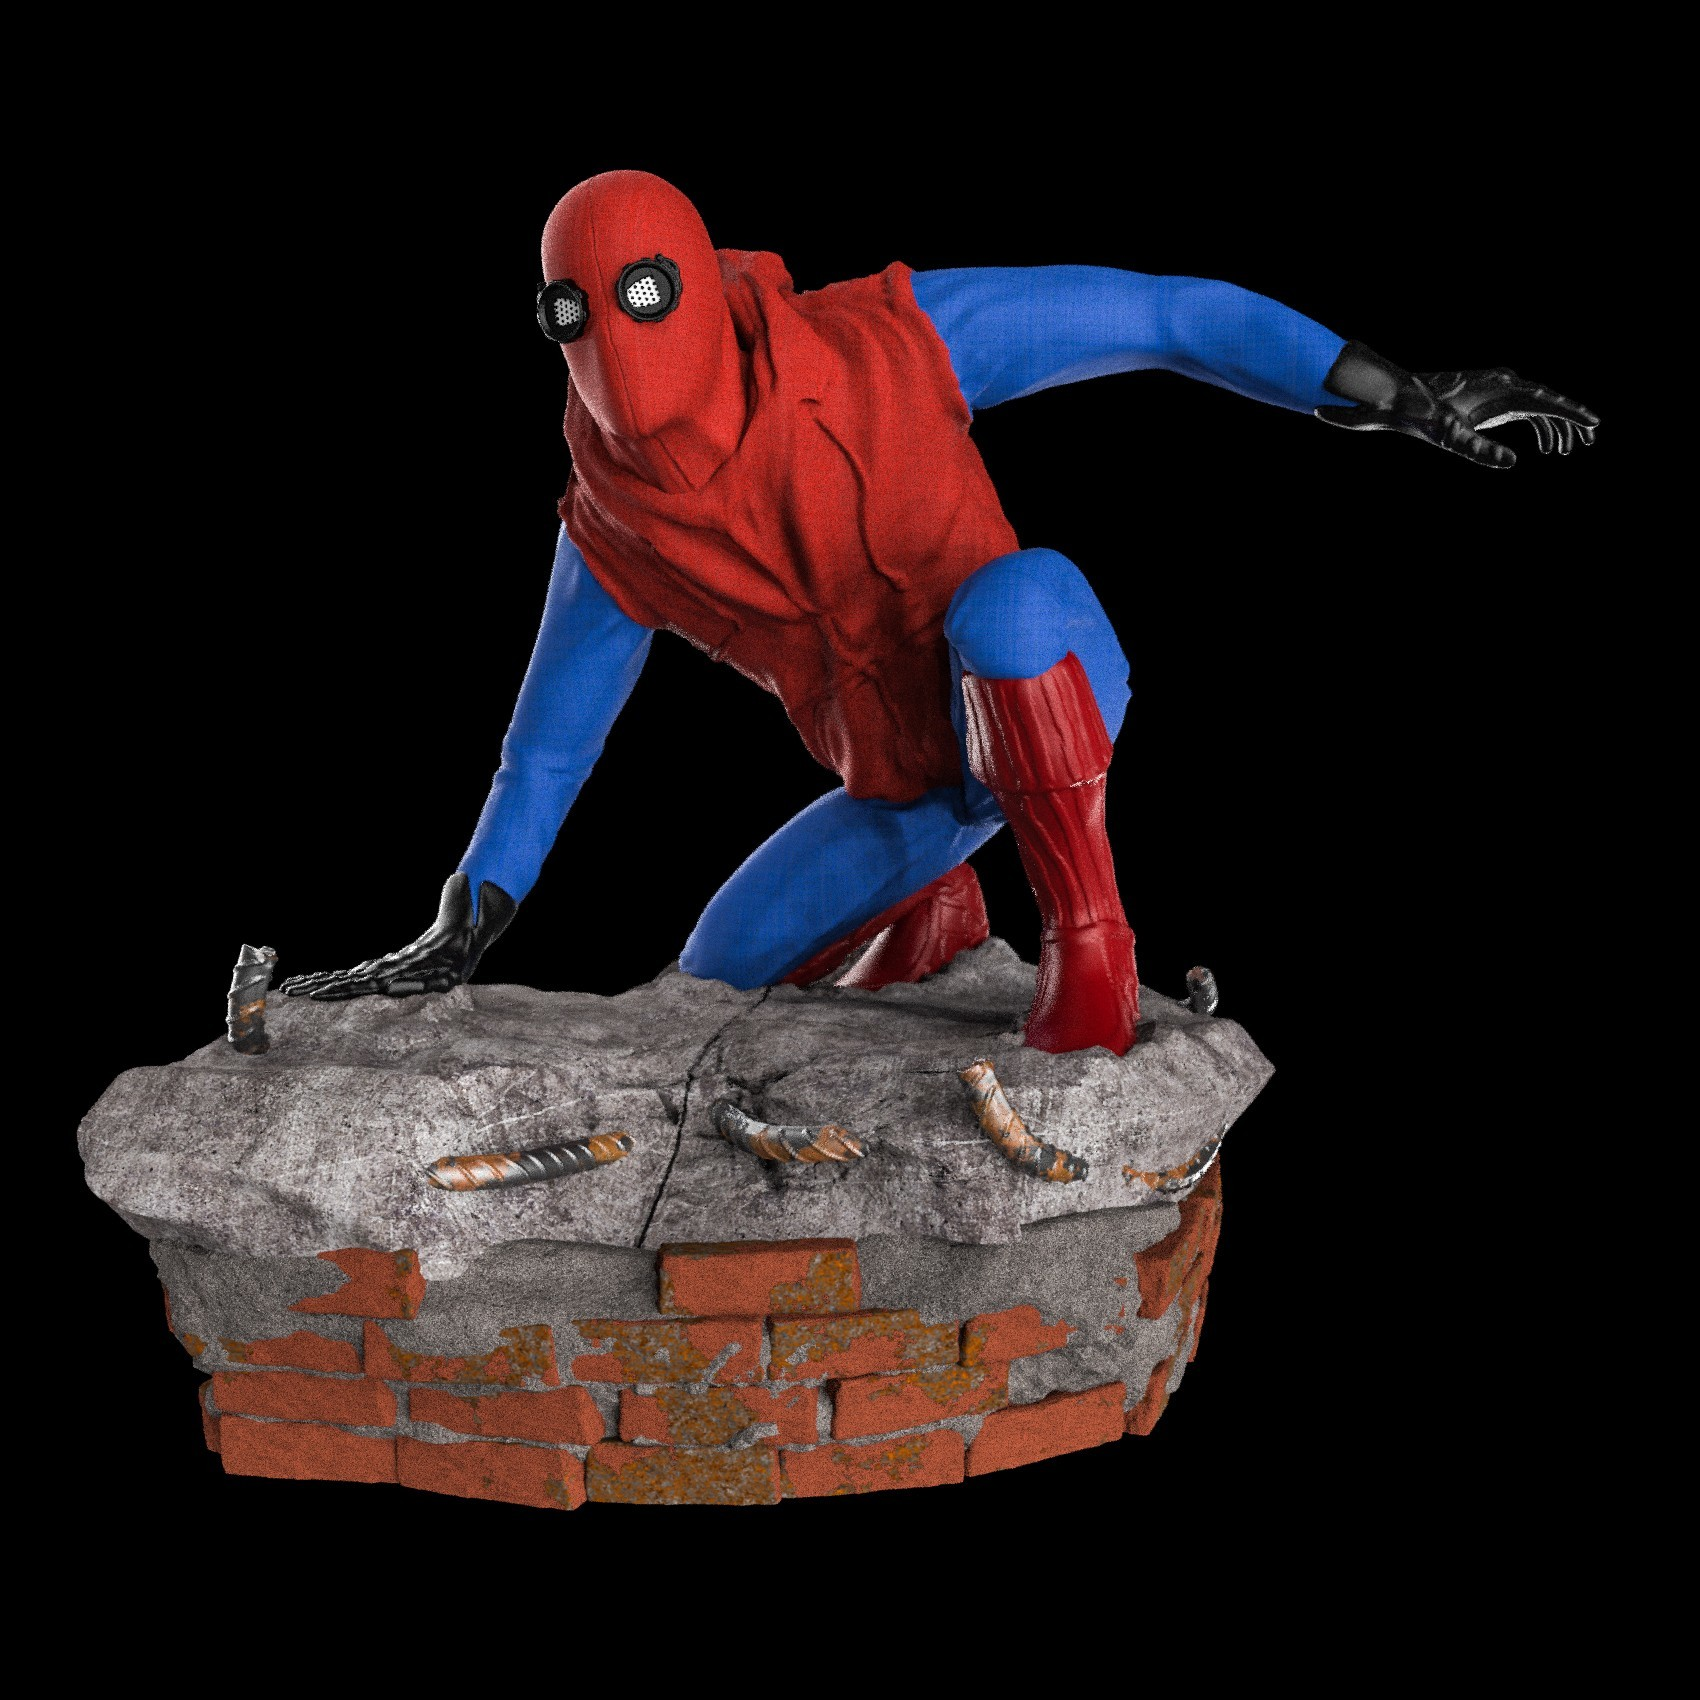 14.jpg Download STL file Spider-Man Homemade Suit • Design to 3D print, tolgaaxu